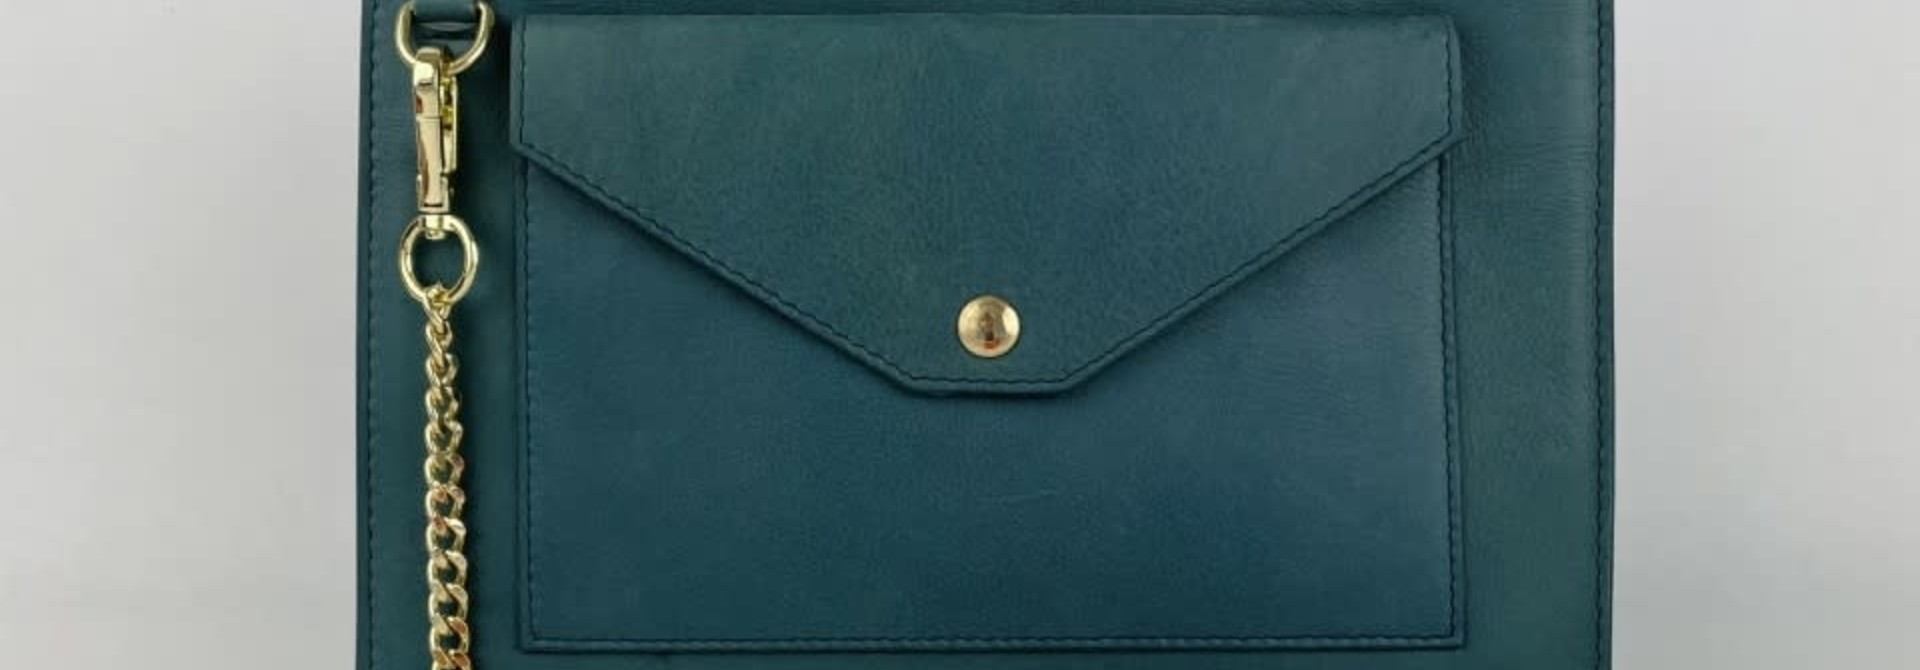 Franca calf leather poche Petrol